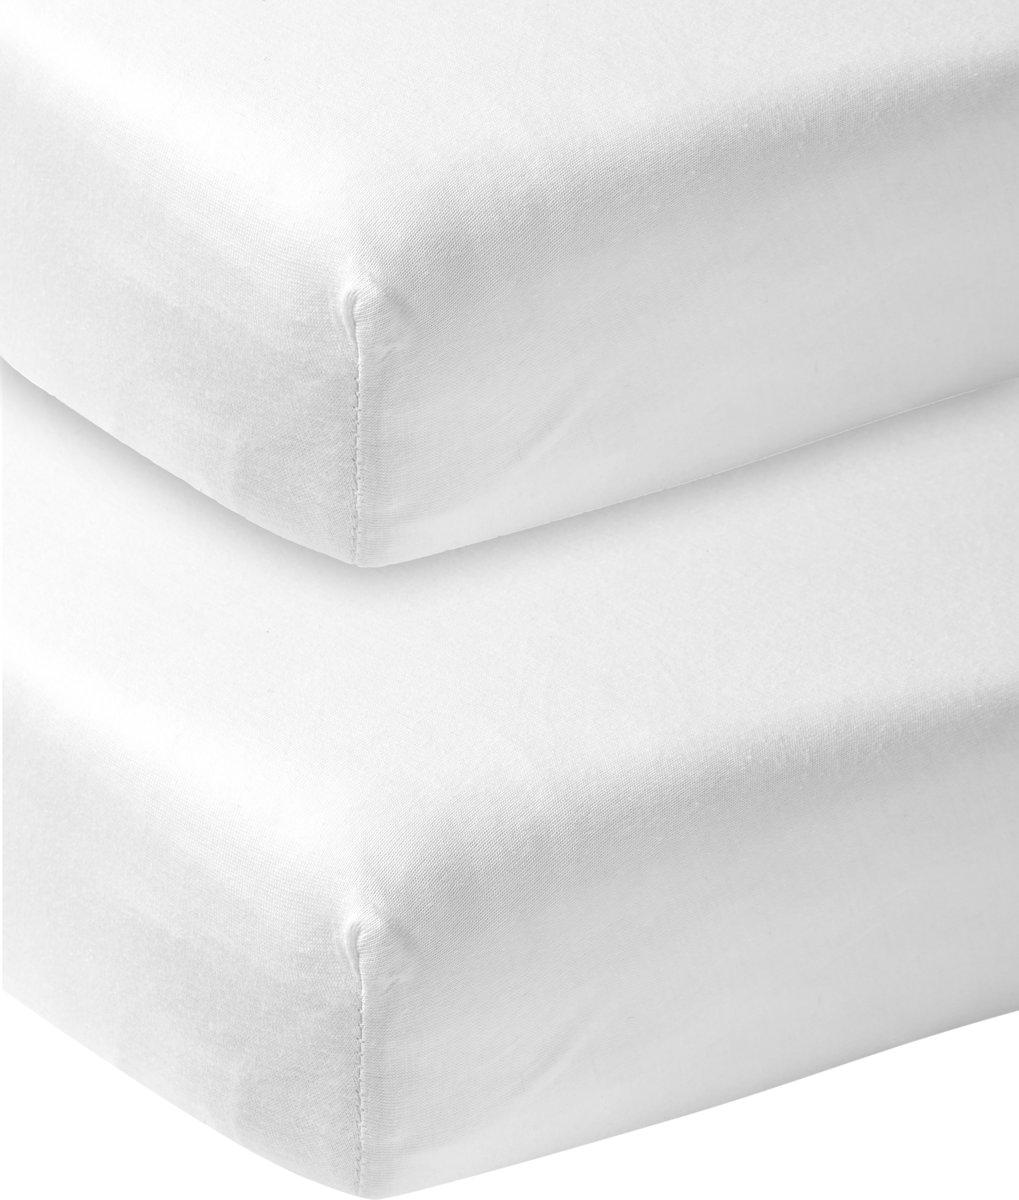 Meyco jersey hoeslaken 2-pack - 60x120 - wit